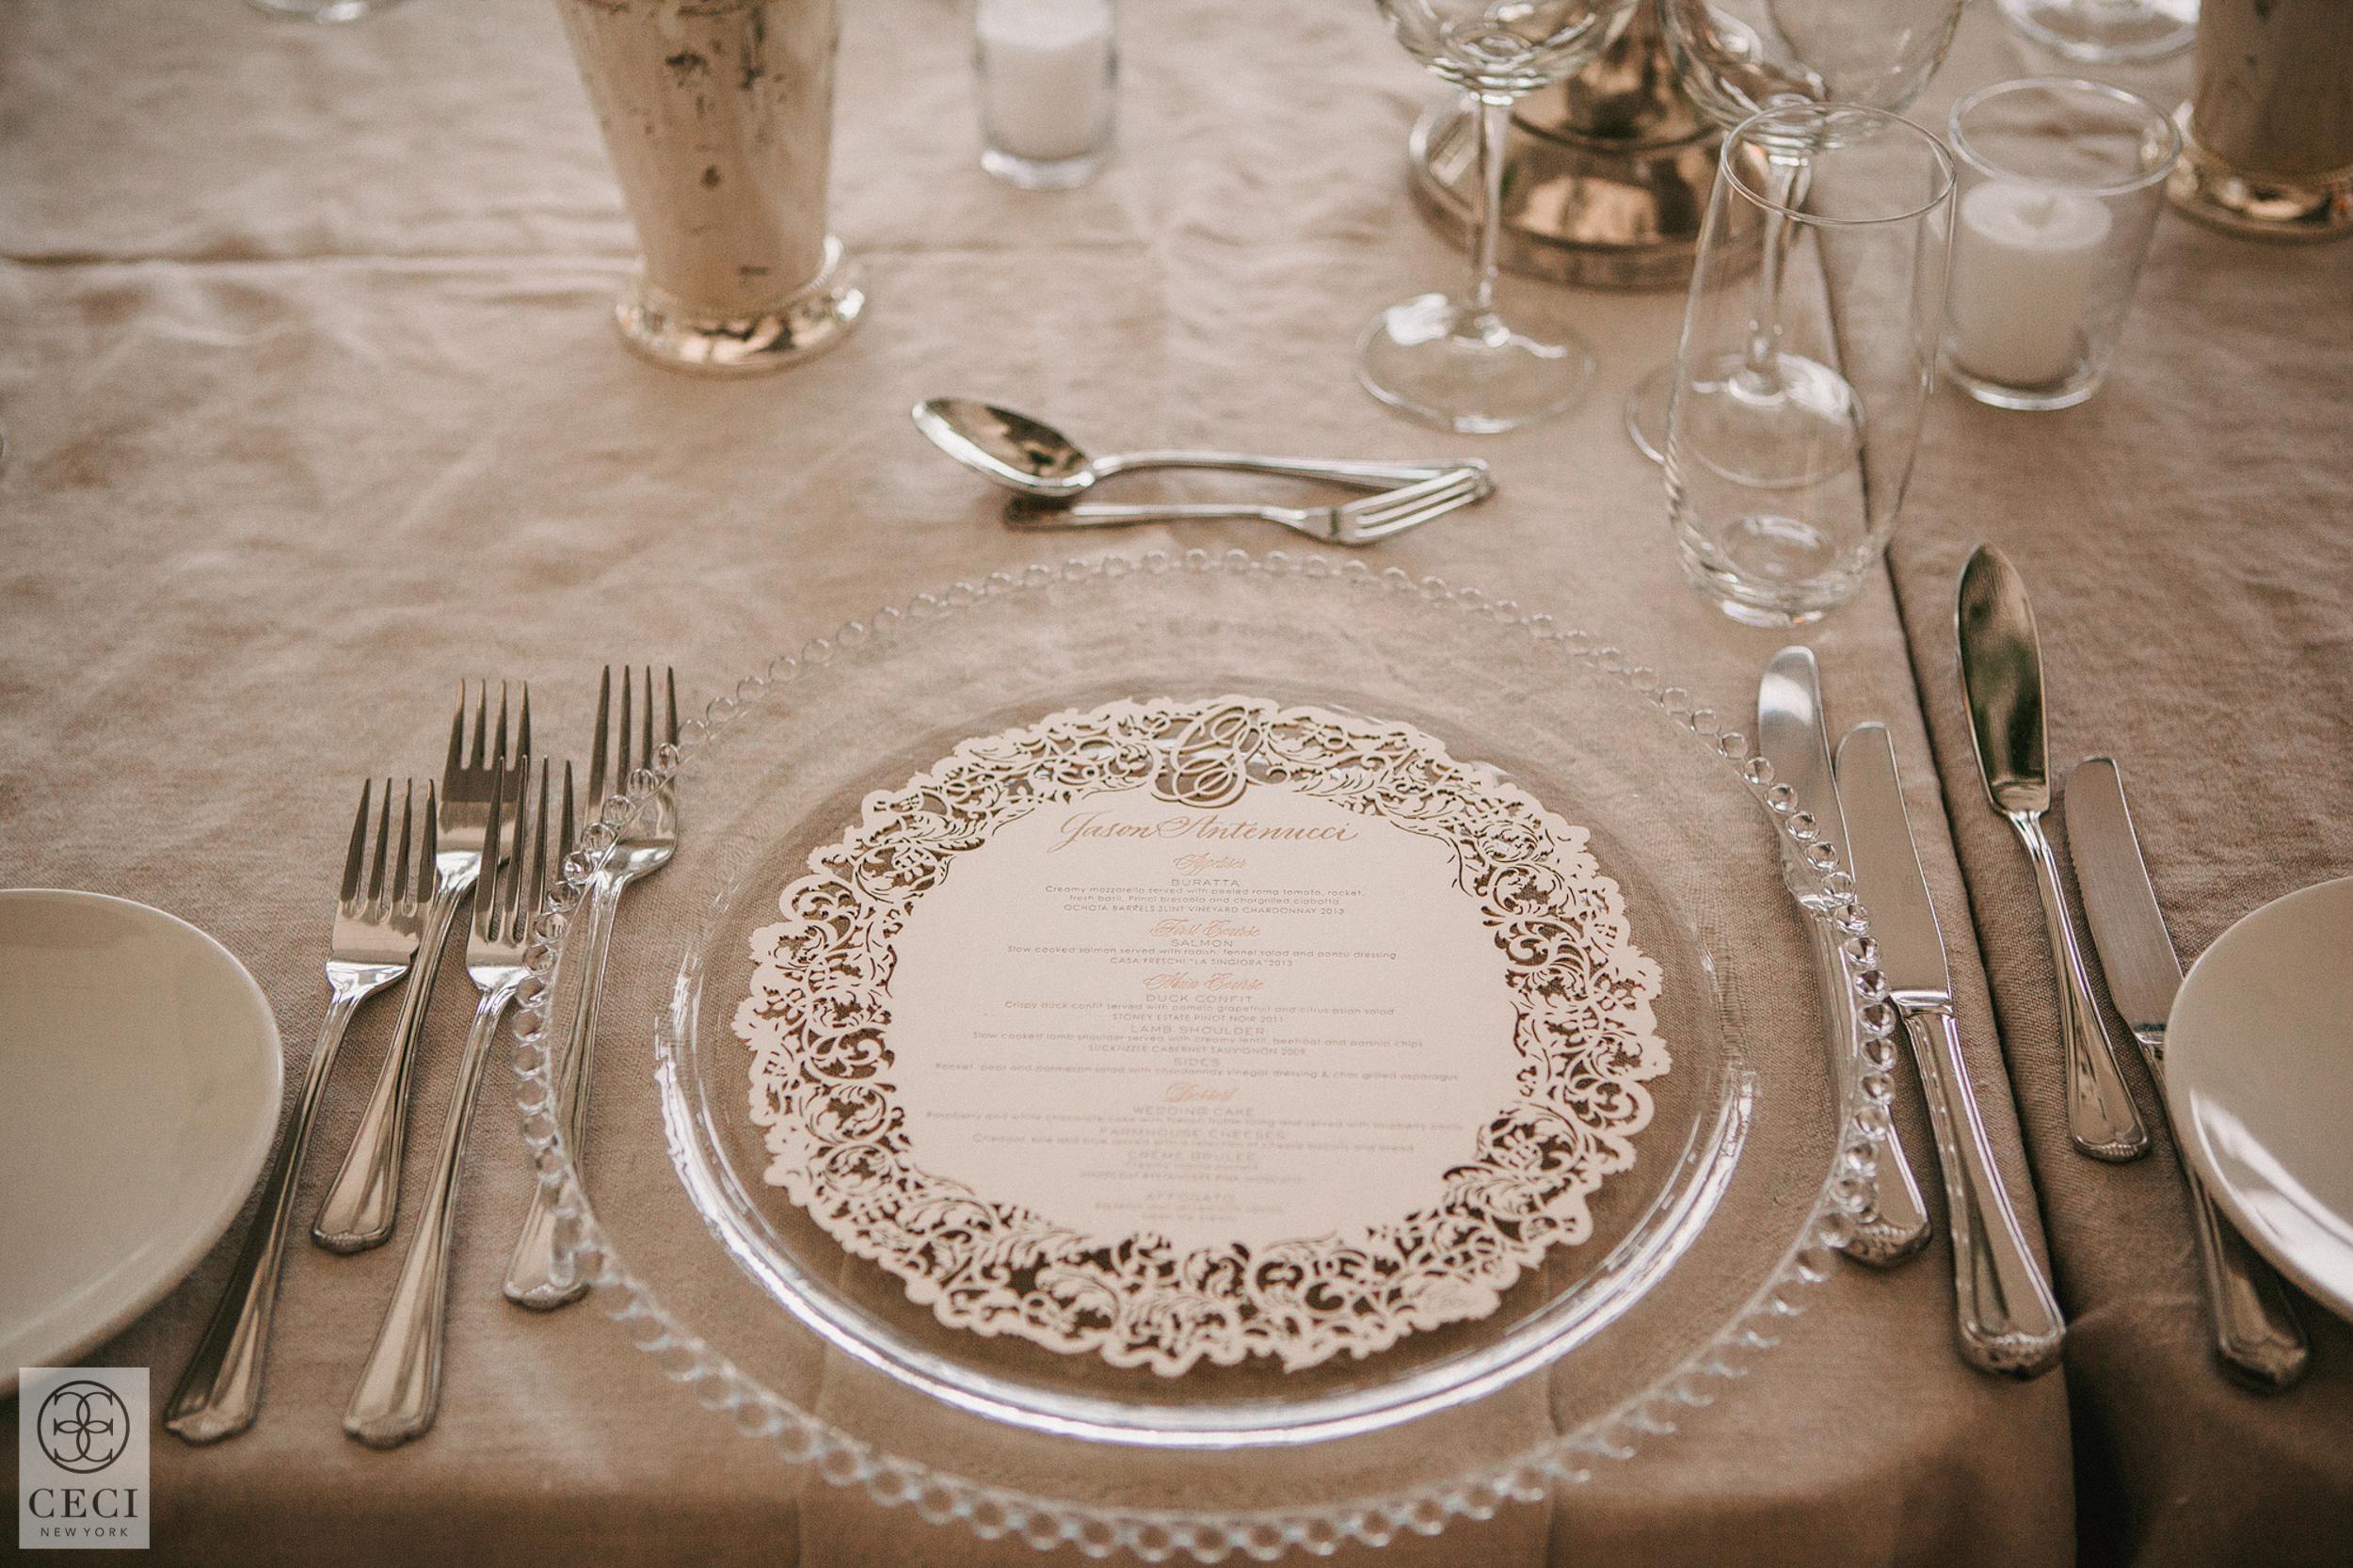 Ceci_New_York_Custom_Luxury_Wedding_BeautyShot_LaserCut_Stationery_Personalized_Couture_Foil_Stamping_Perth_Destination_Australia_Chic_-9.jpg